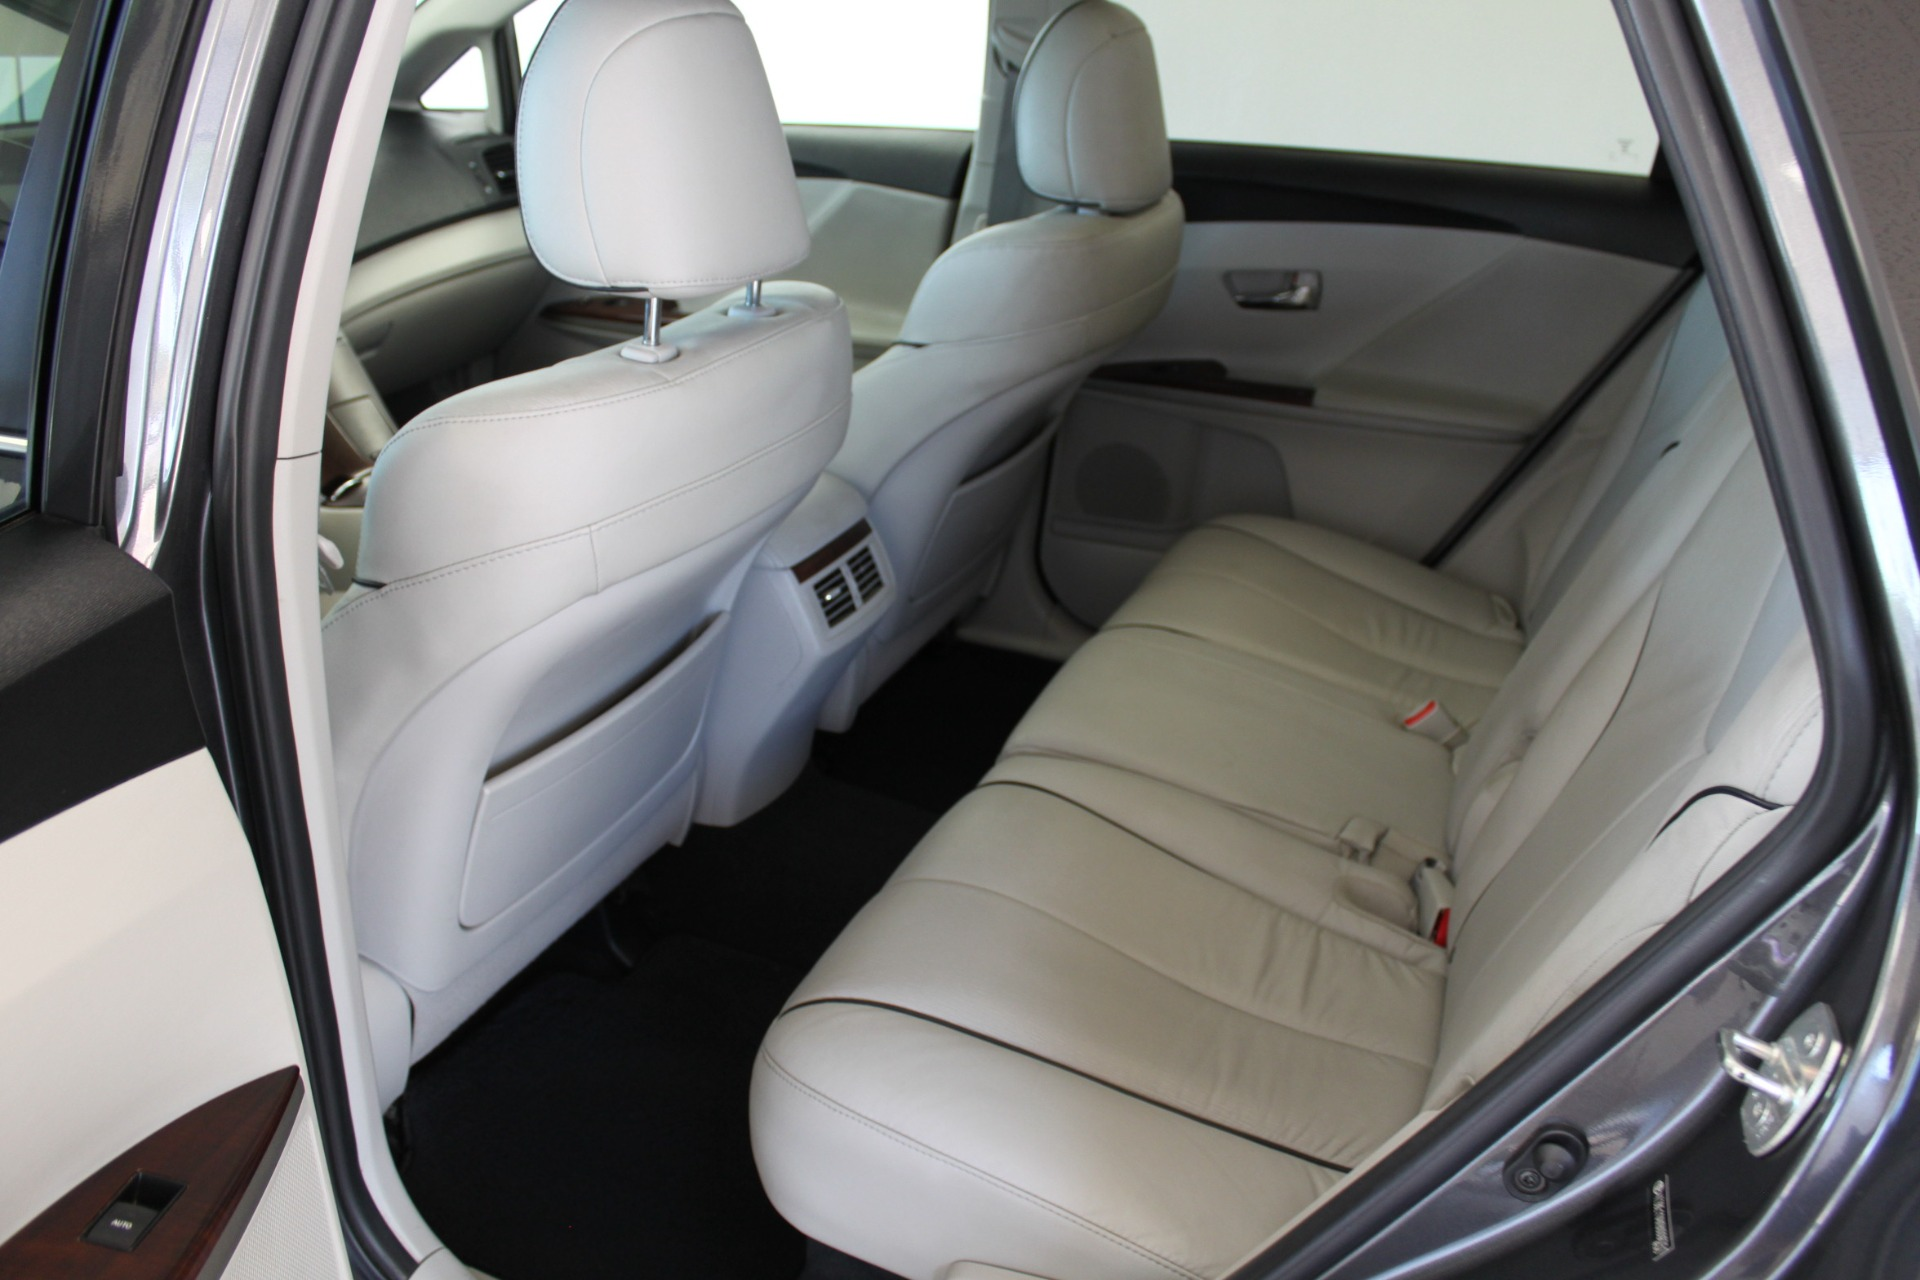 Used-2009-Toyota-Venza-SE-AWD-Chevelle